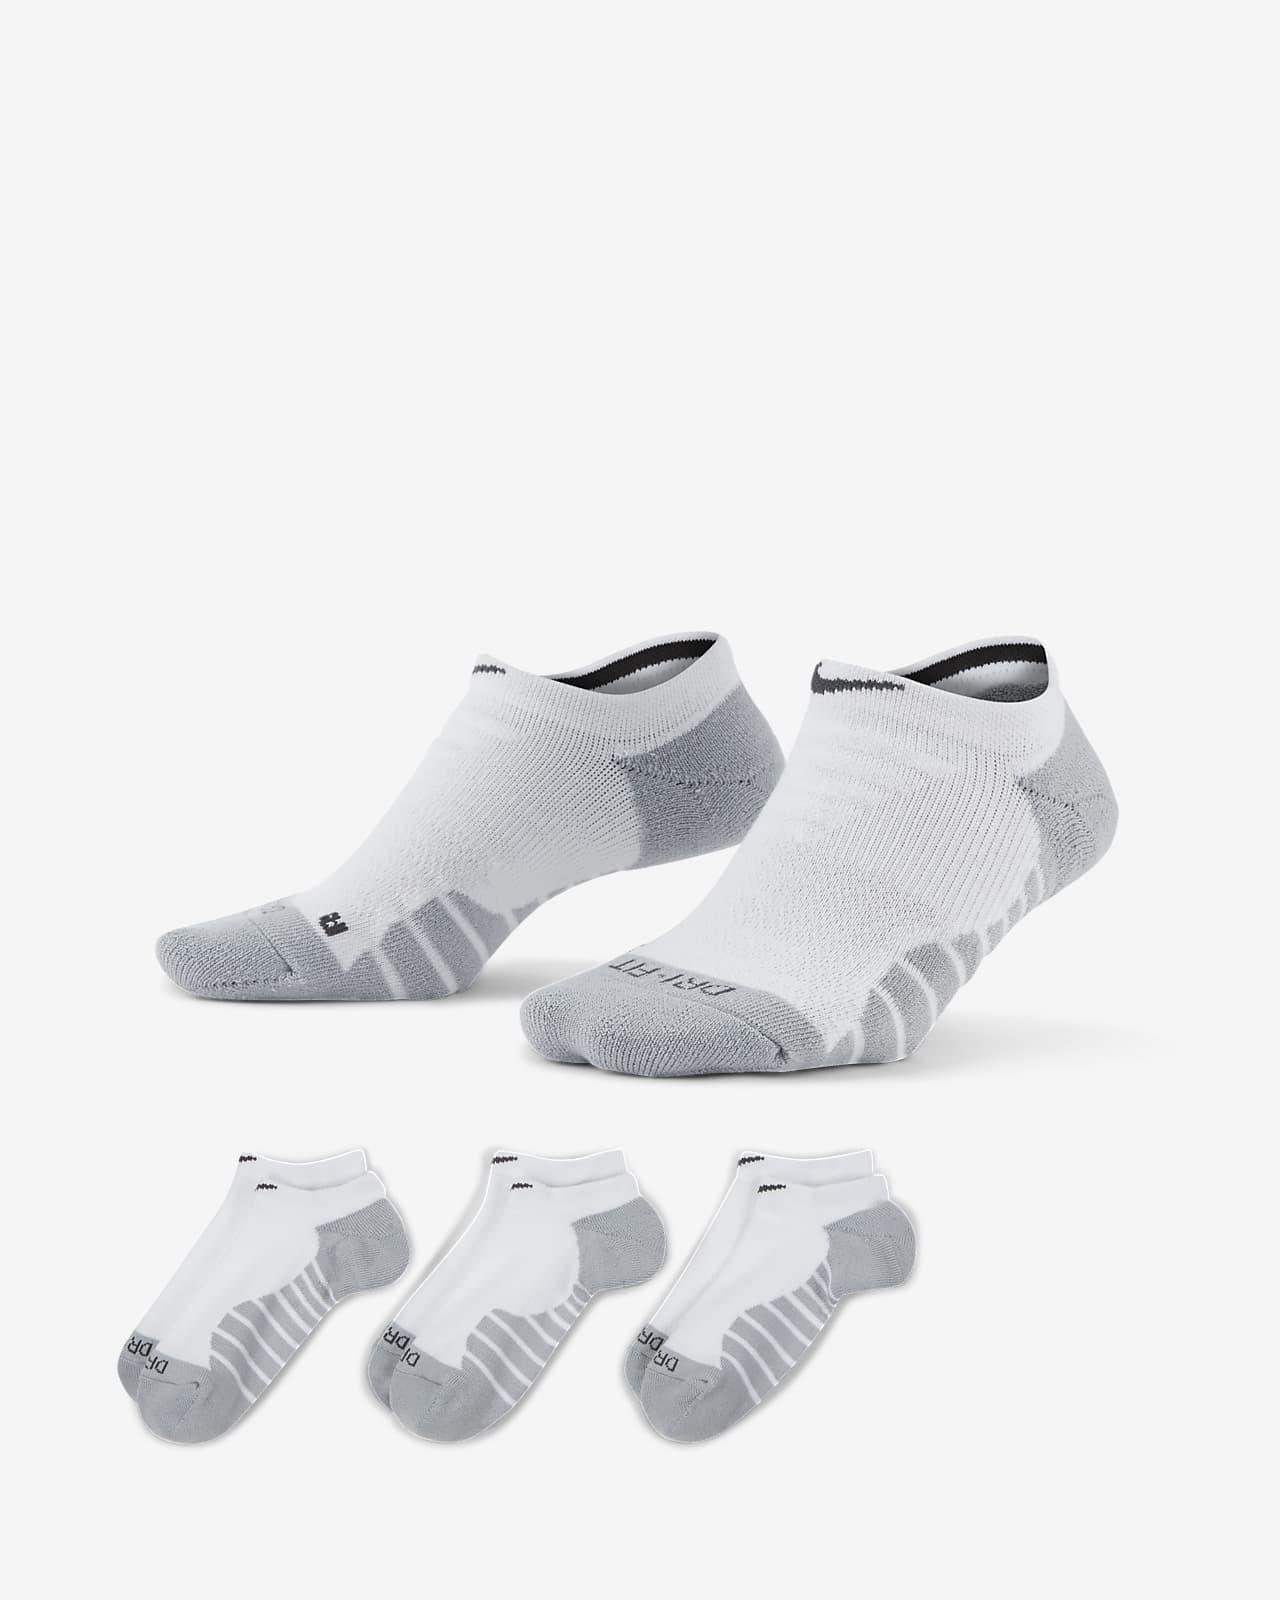 Nike Everyday Max Cushioned Women's Training No-Show Socks (3 Pairs)